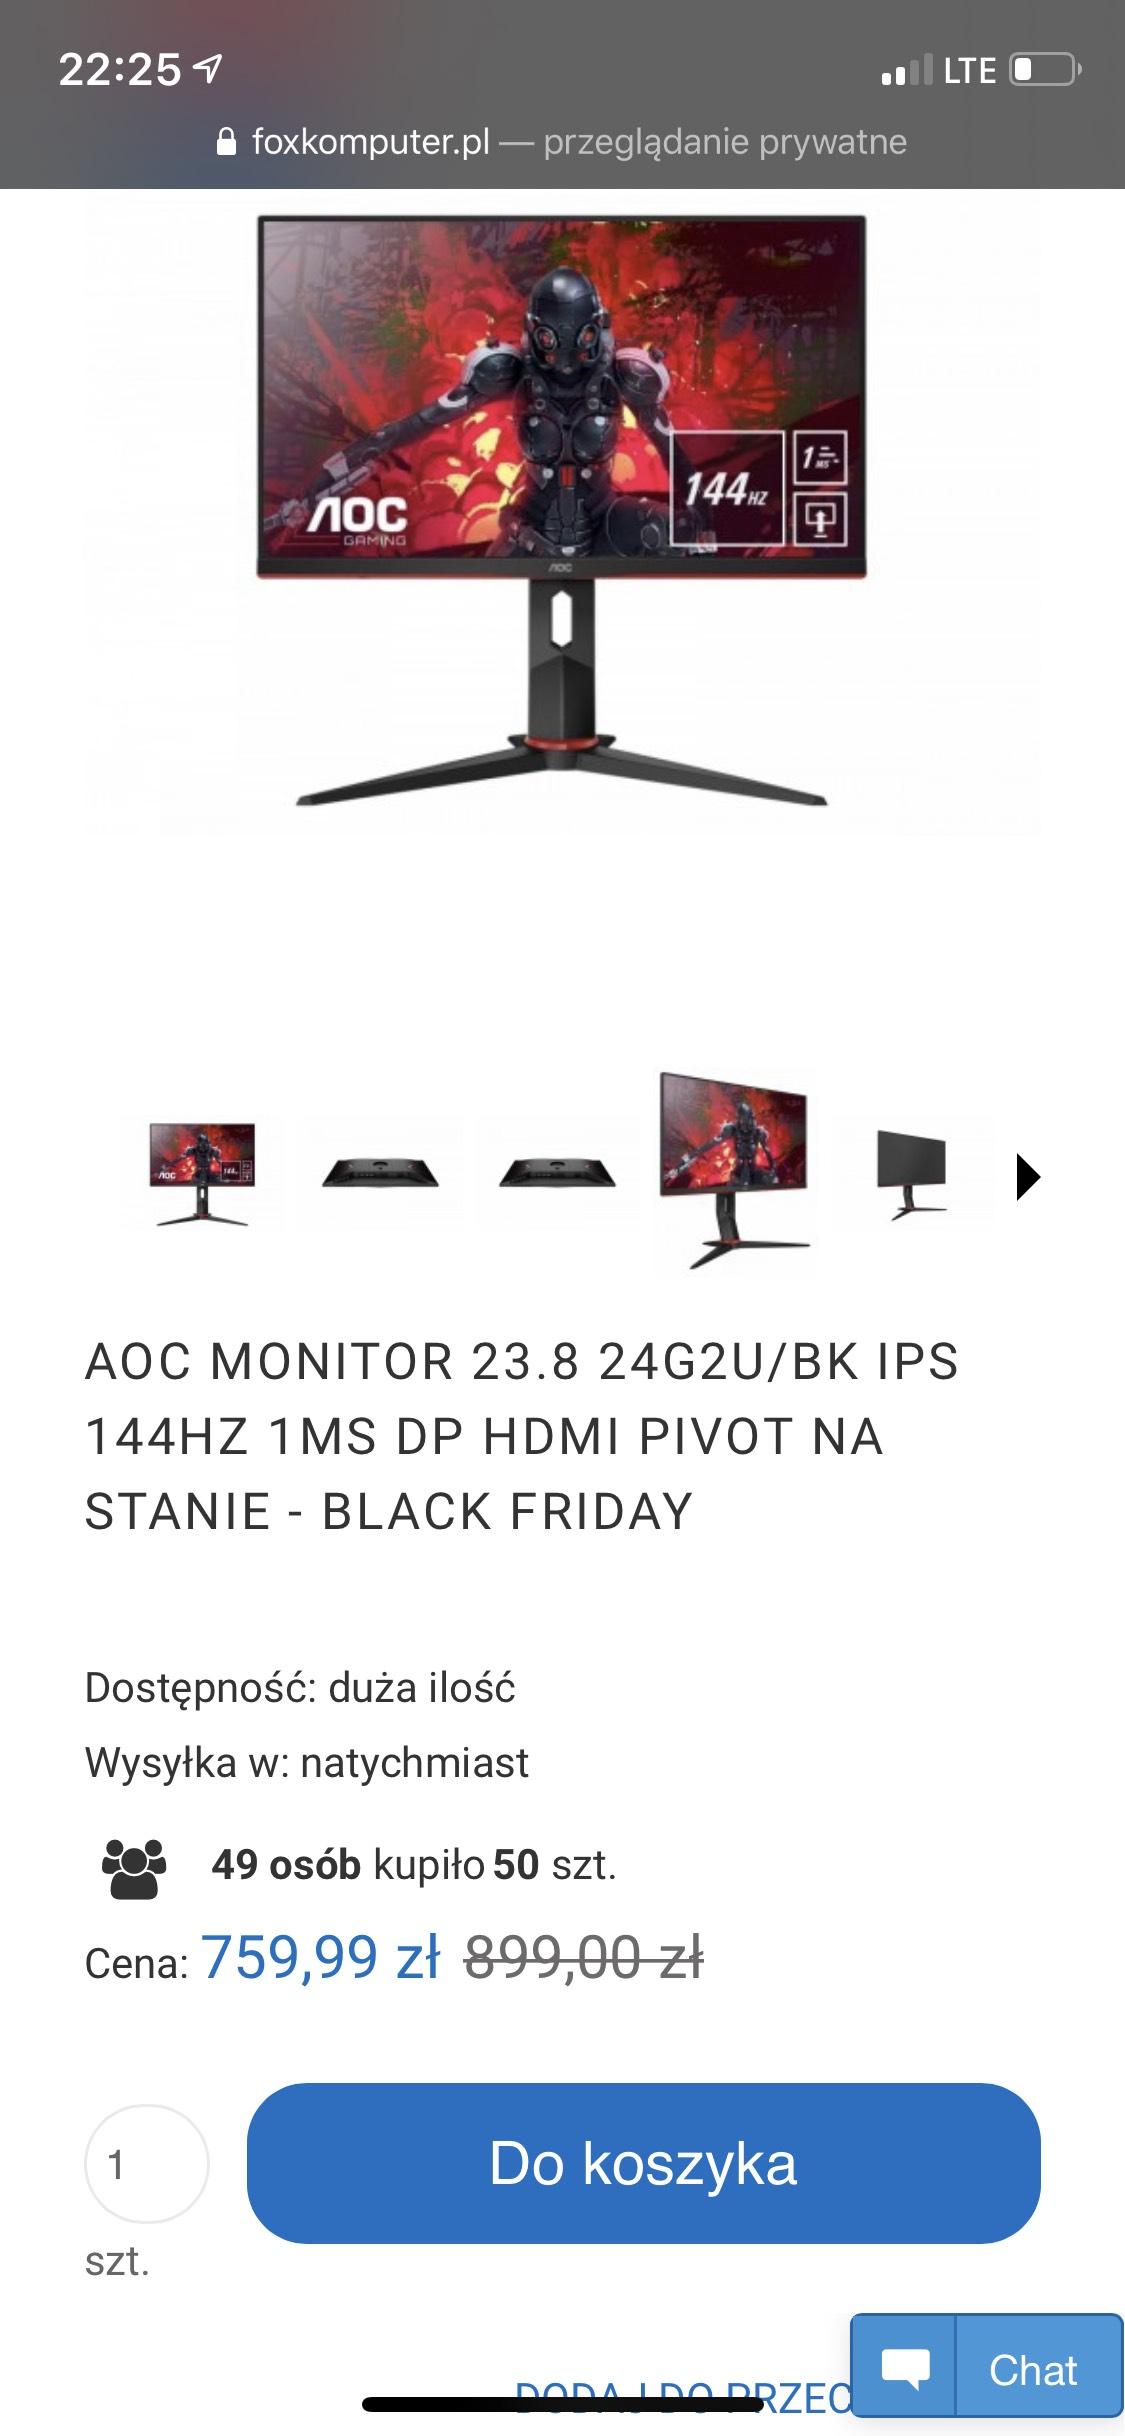 Monitor AOC 23.8 24G2U